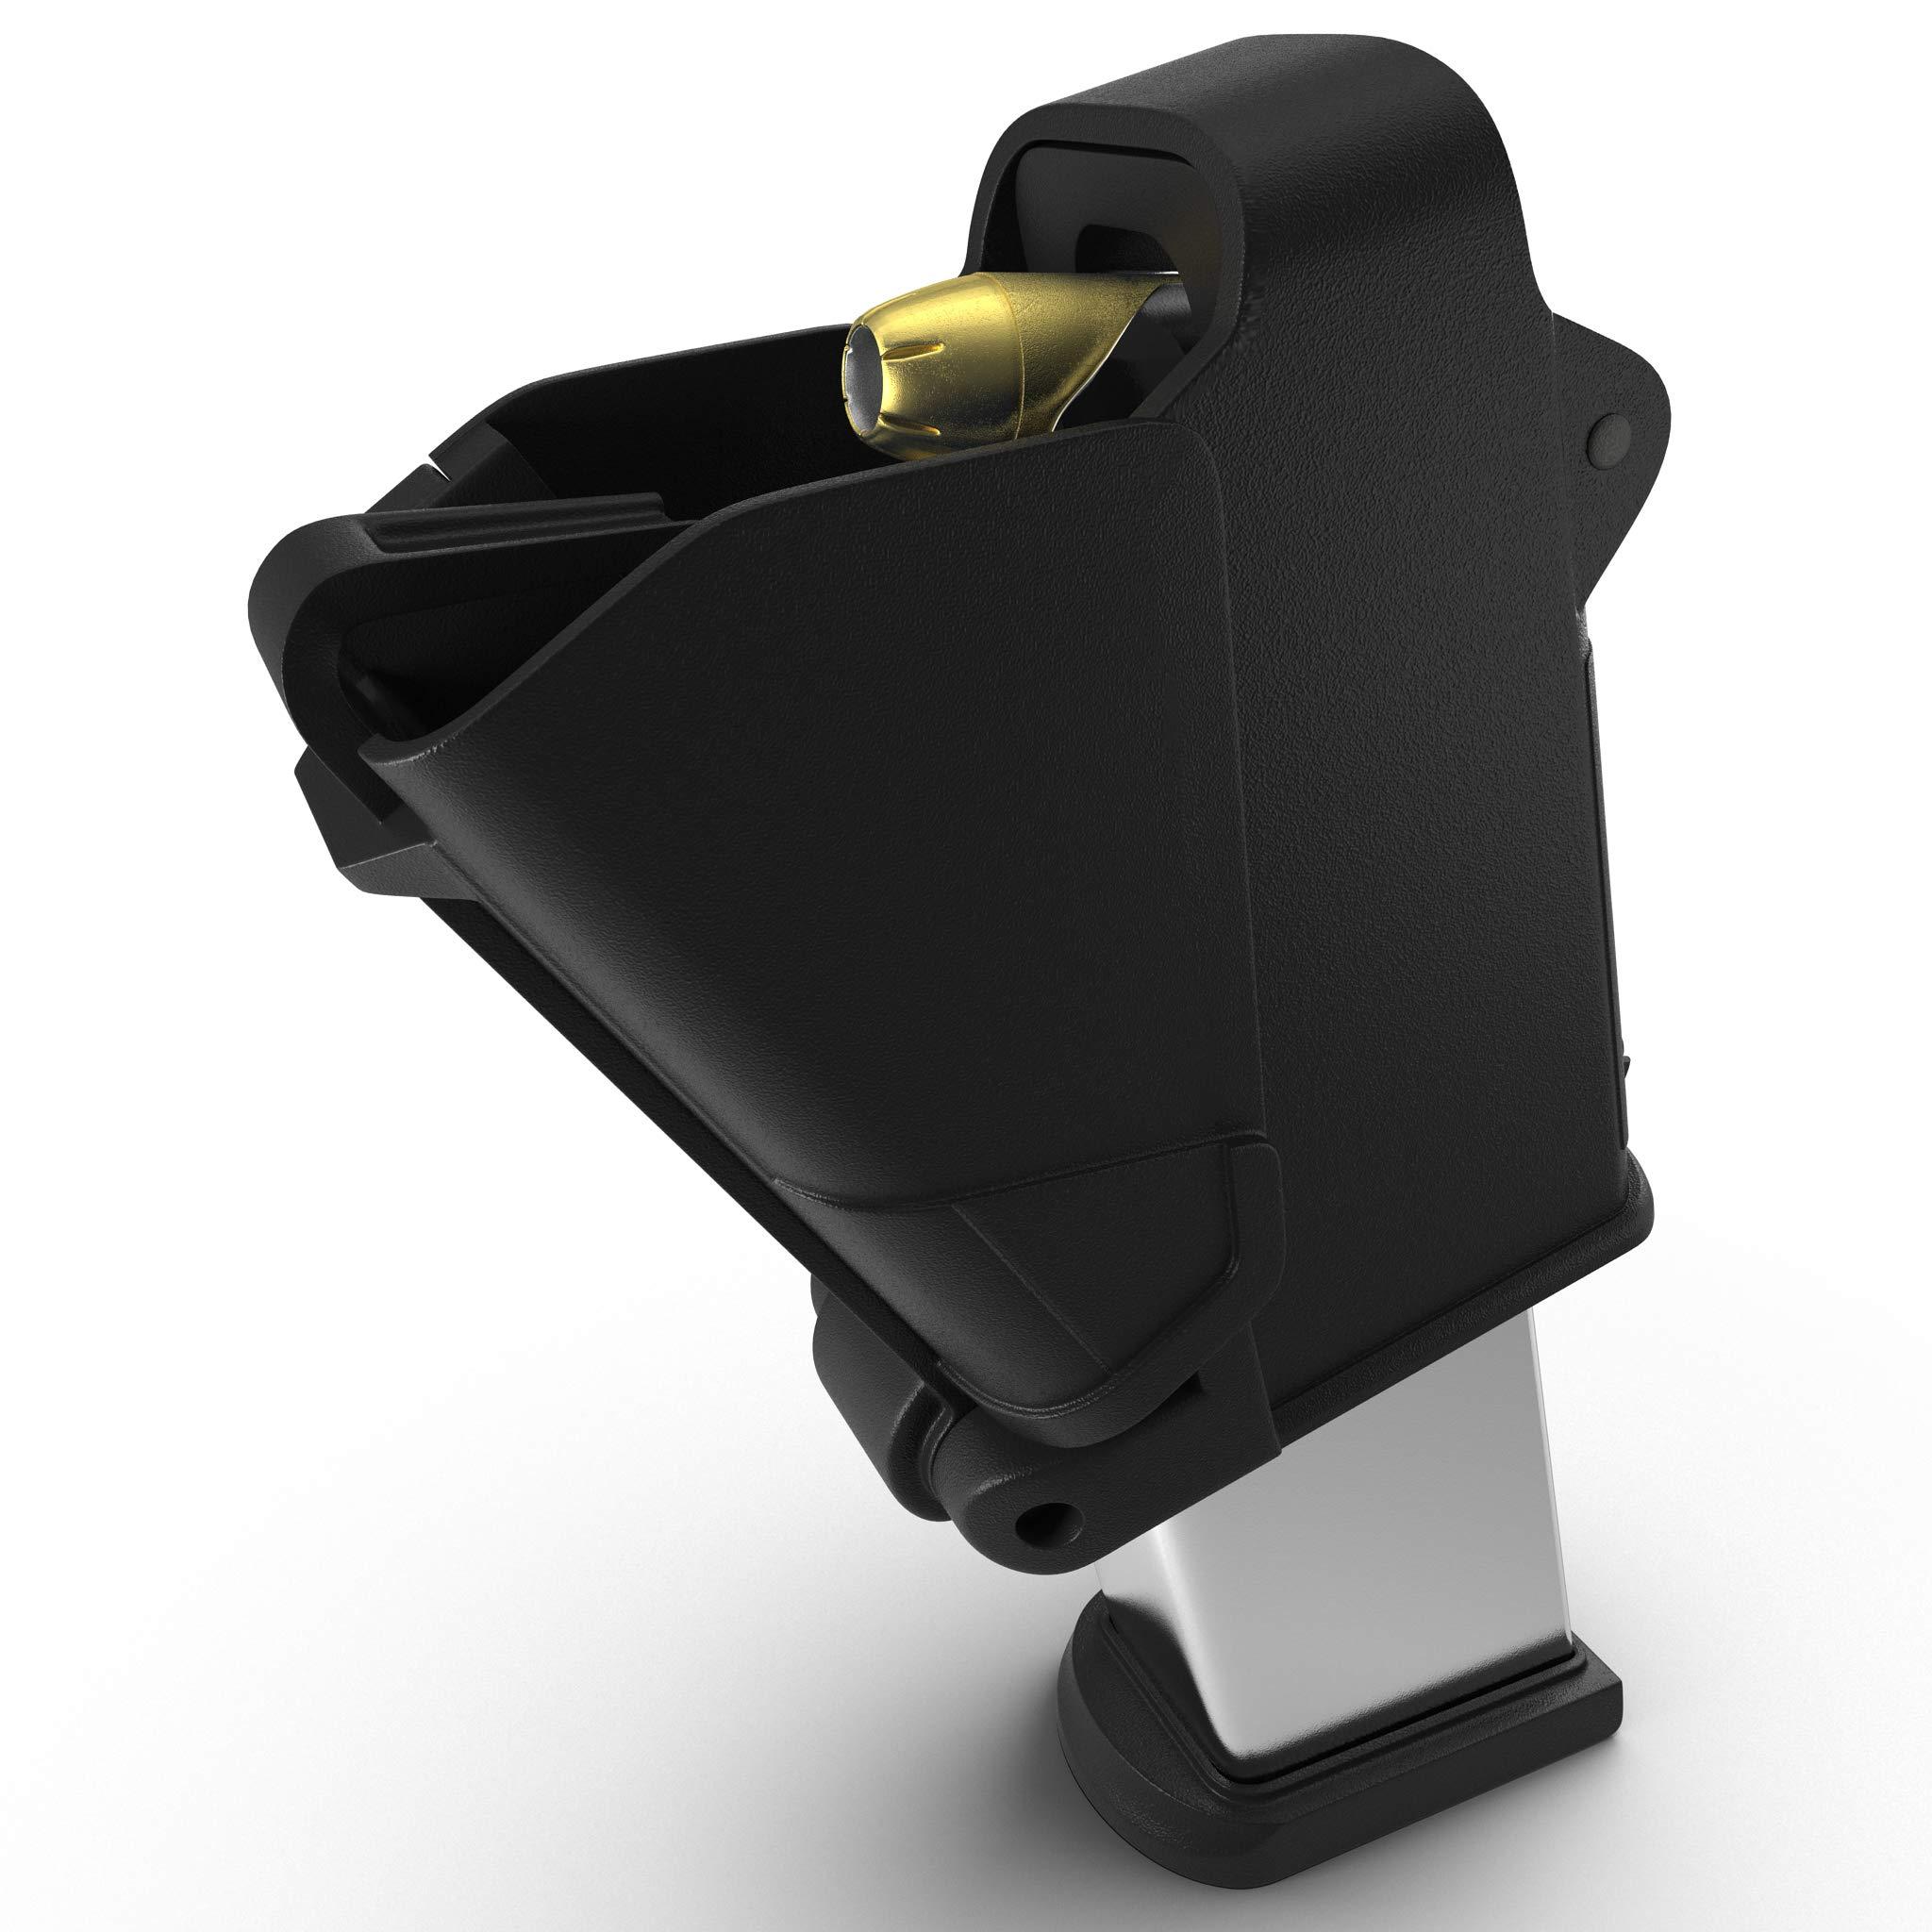 Magload Universal Pistol Magazine Loader/Unloader, Fits 9mm-45 ACP UP60 by Magload